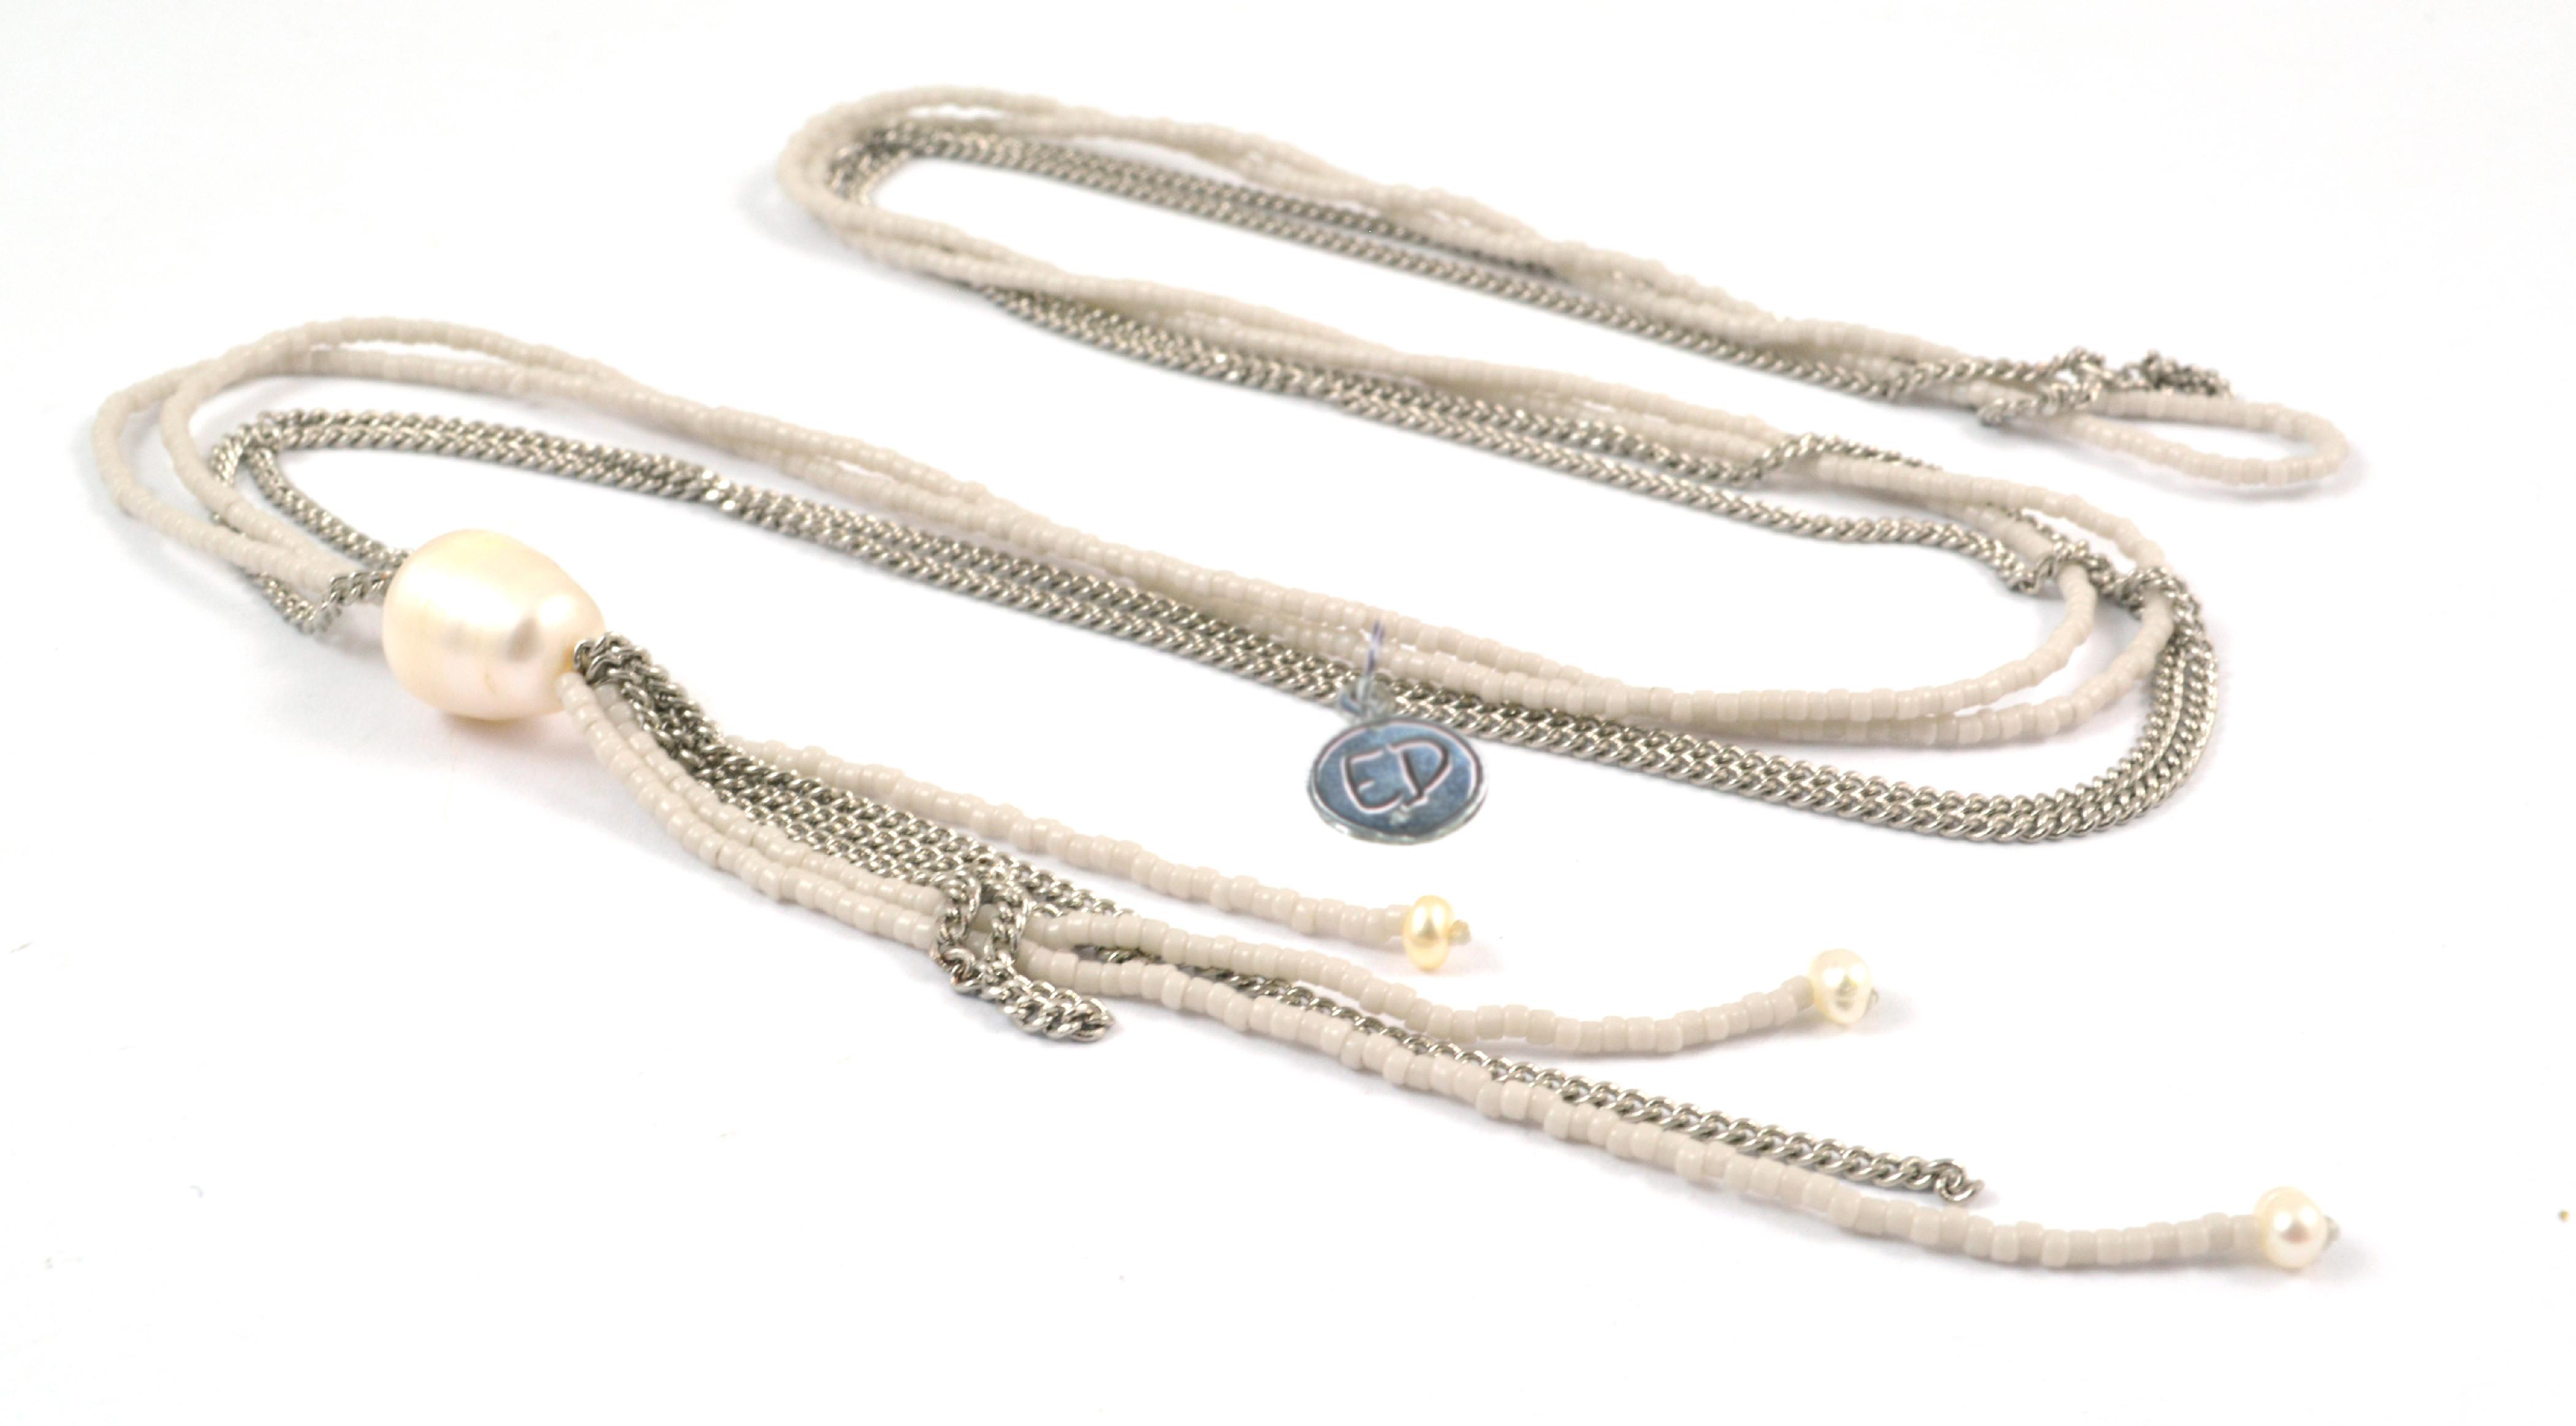 Dámsky prírodný náhrdelník z japonského rokajlu a riečnych perál - krémový